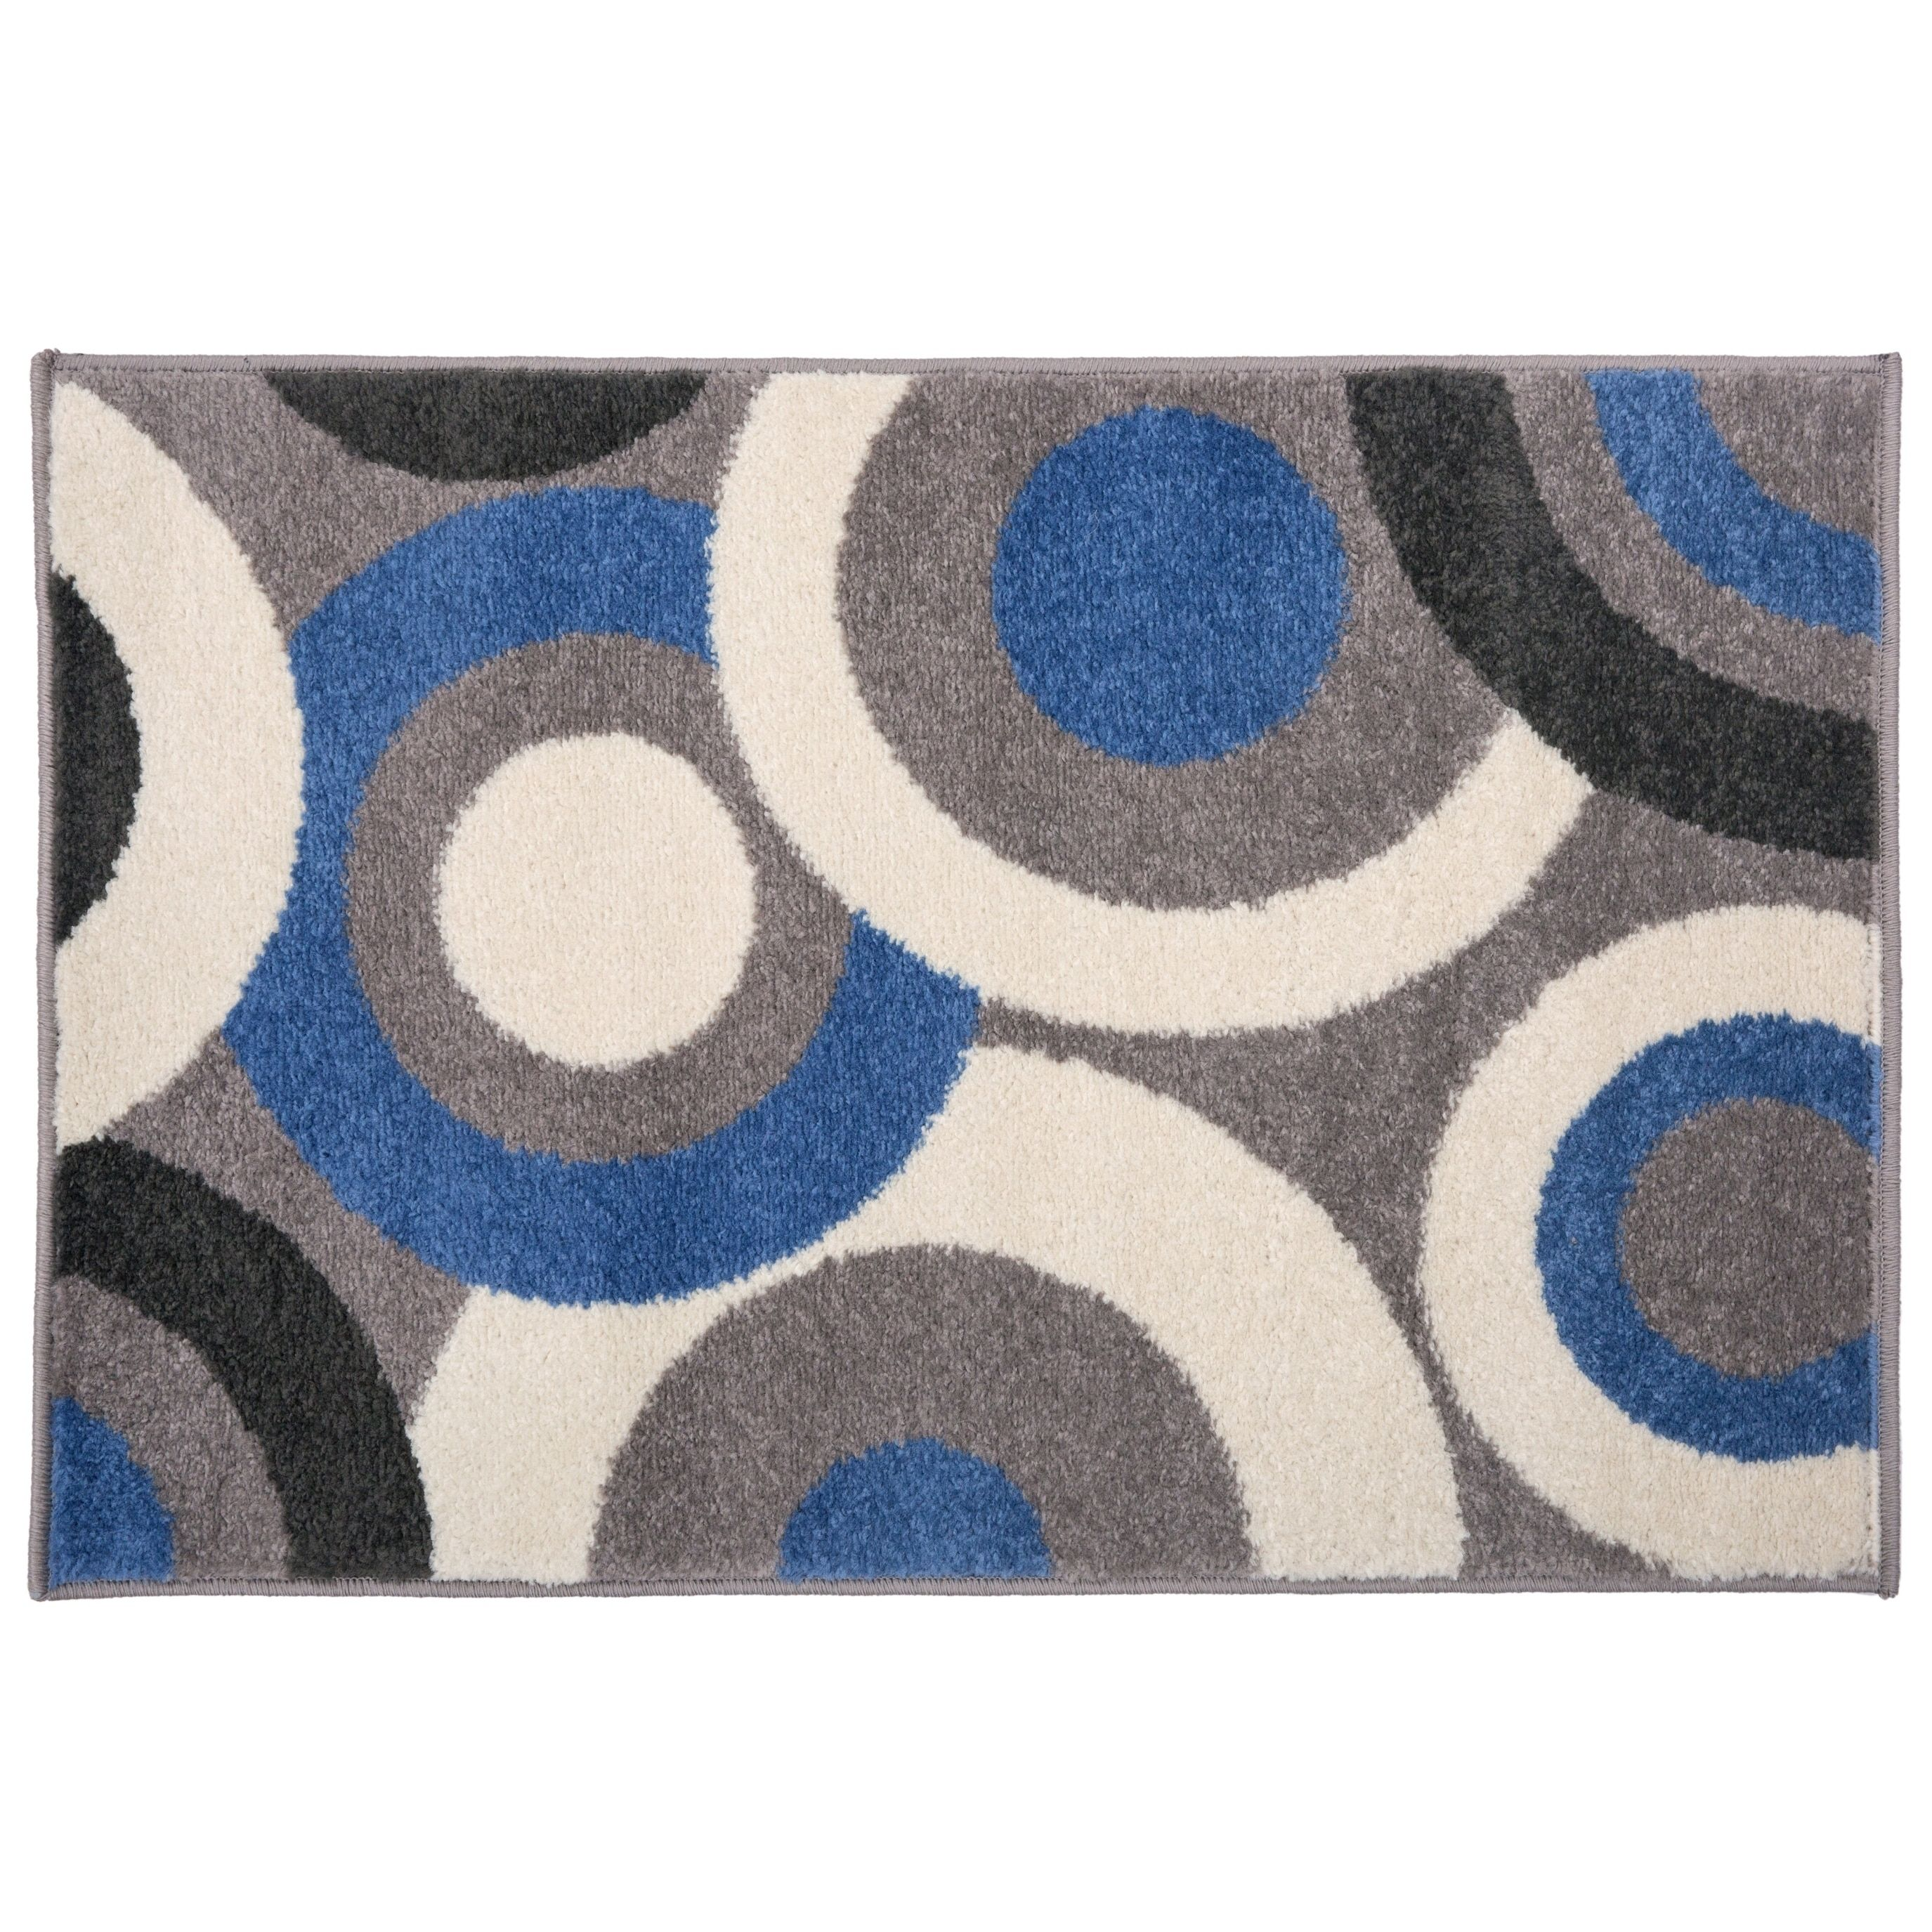 Contemporary Modern Circles Rug Blue 2 X 3 Osti Circle Rug Rug Gallery